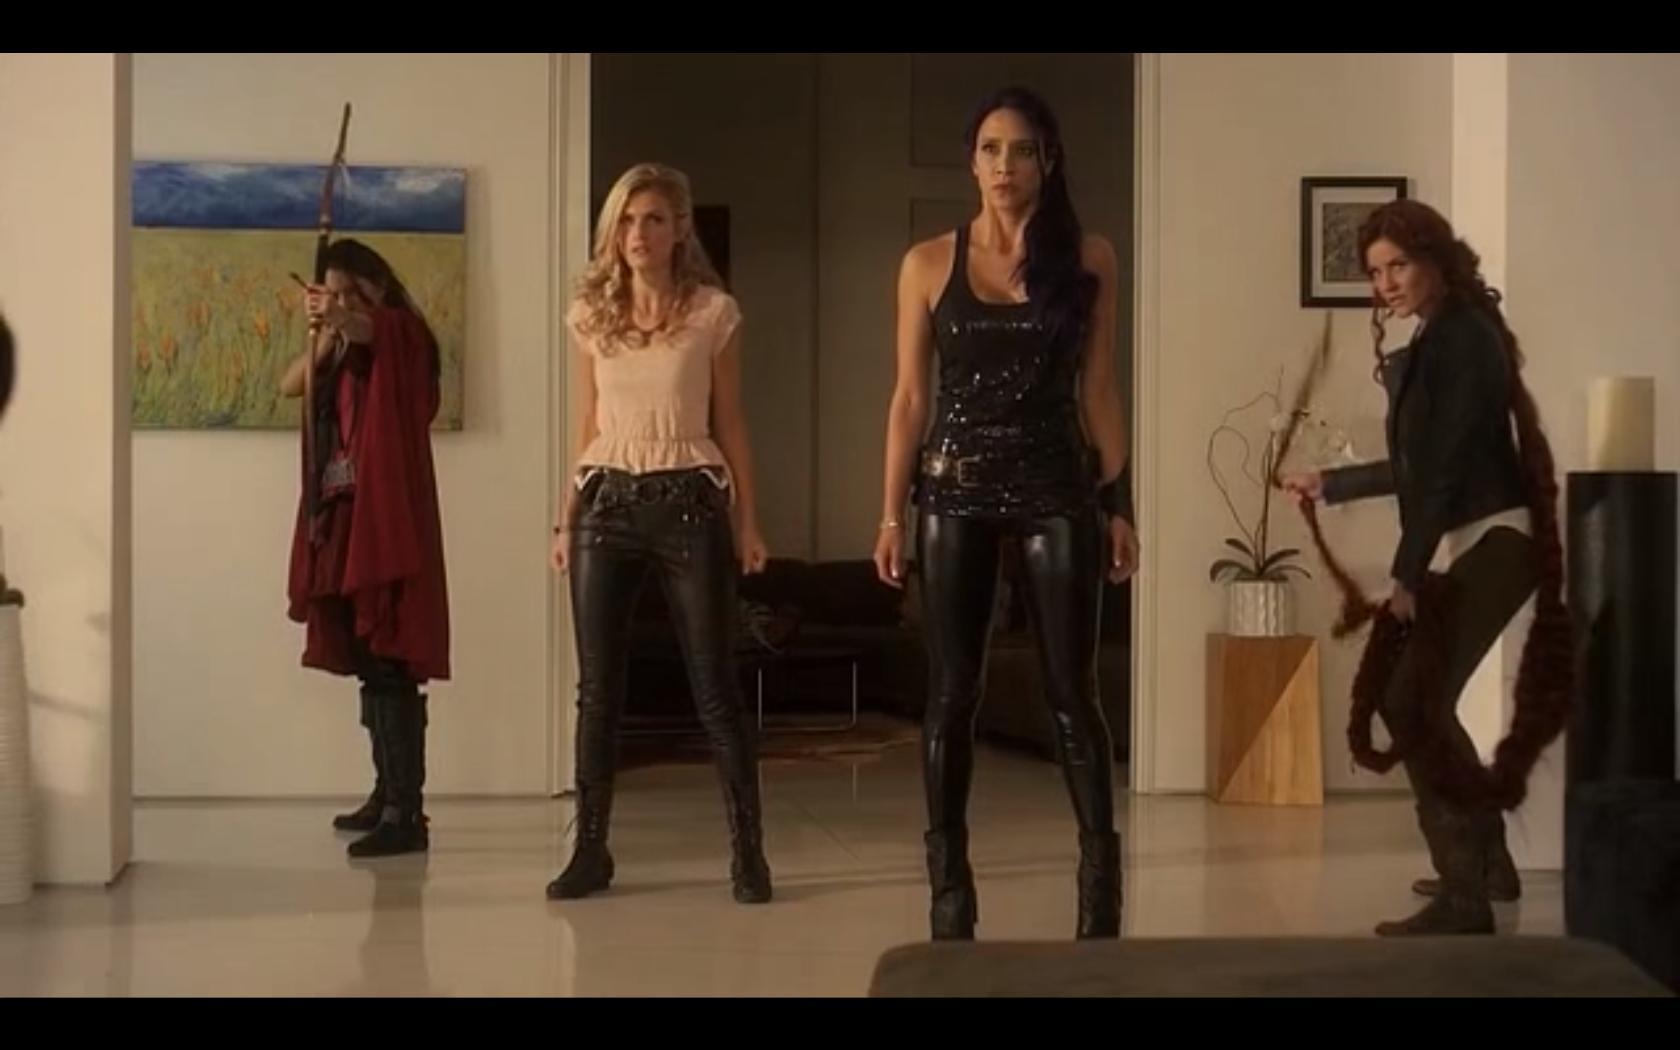 Rileah Vanderbilt, Milynn Sarley, Elizabeth Peterson, and Marah Fairclough in Avengers Grimm (2015)